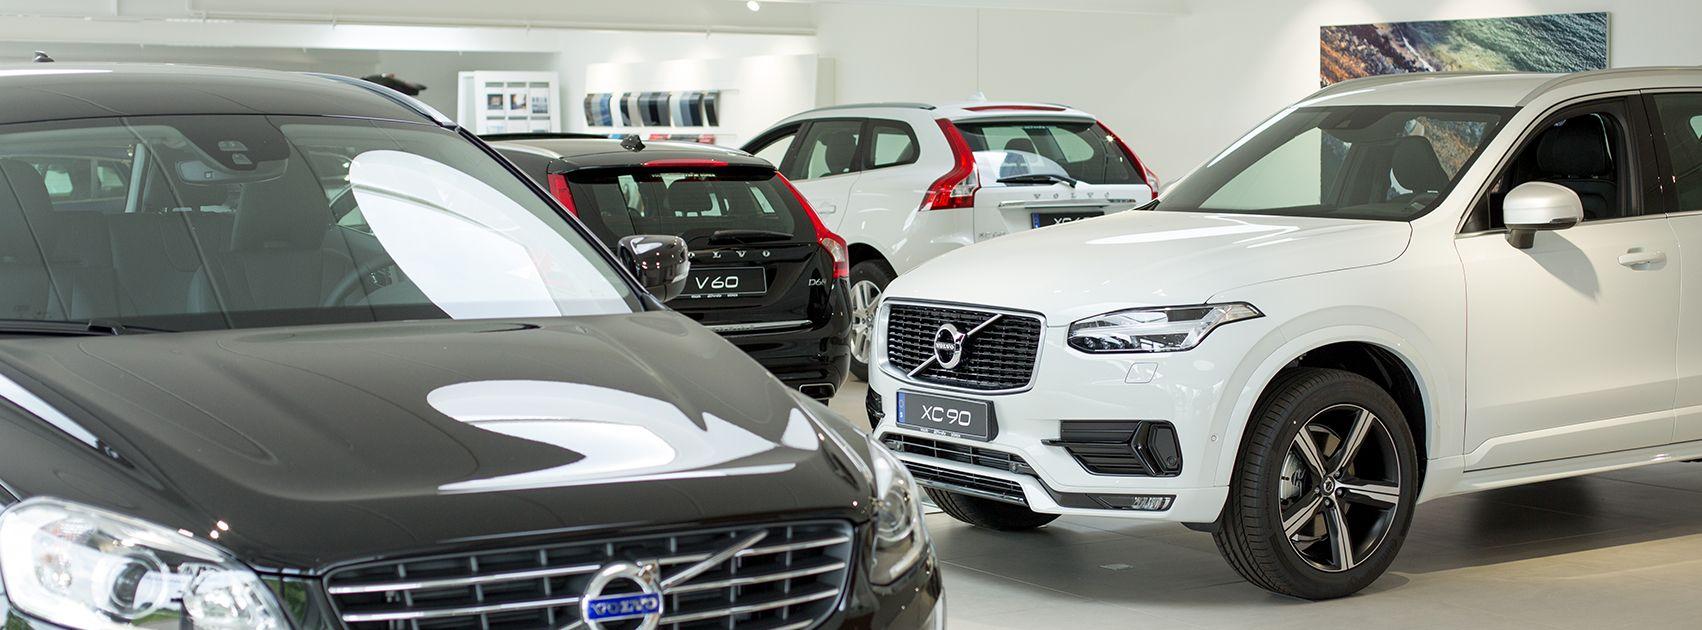 FAHRZEUGANGEBOTE - Fahrzeuge | Autohaus Schmitz